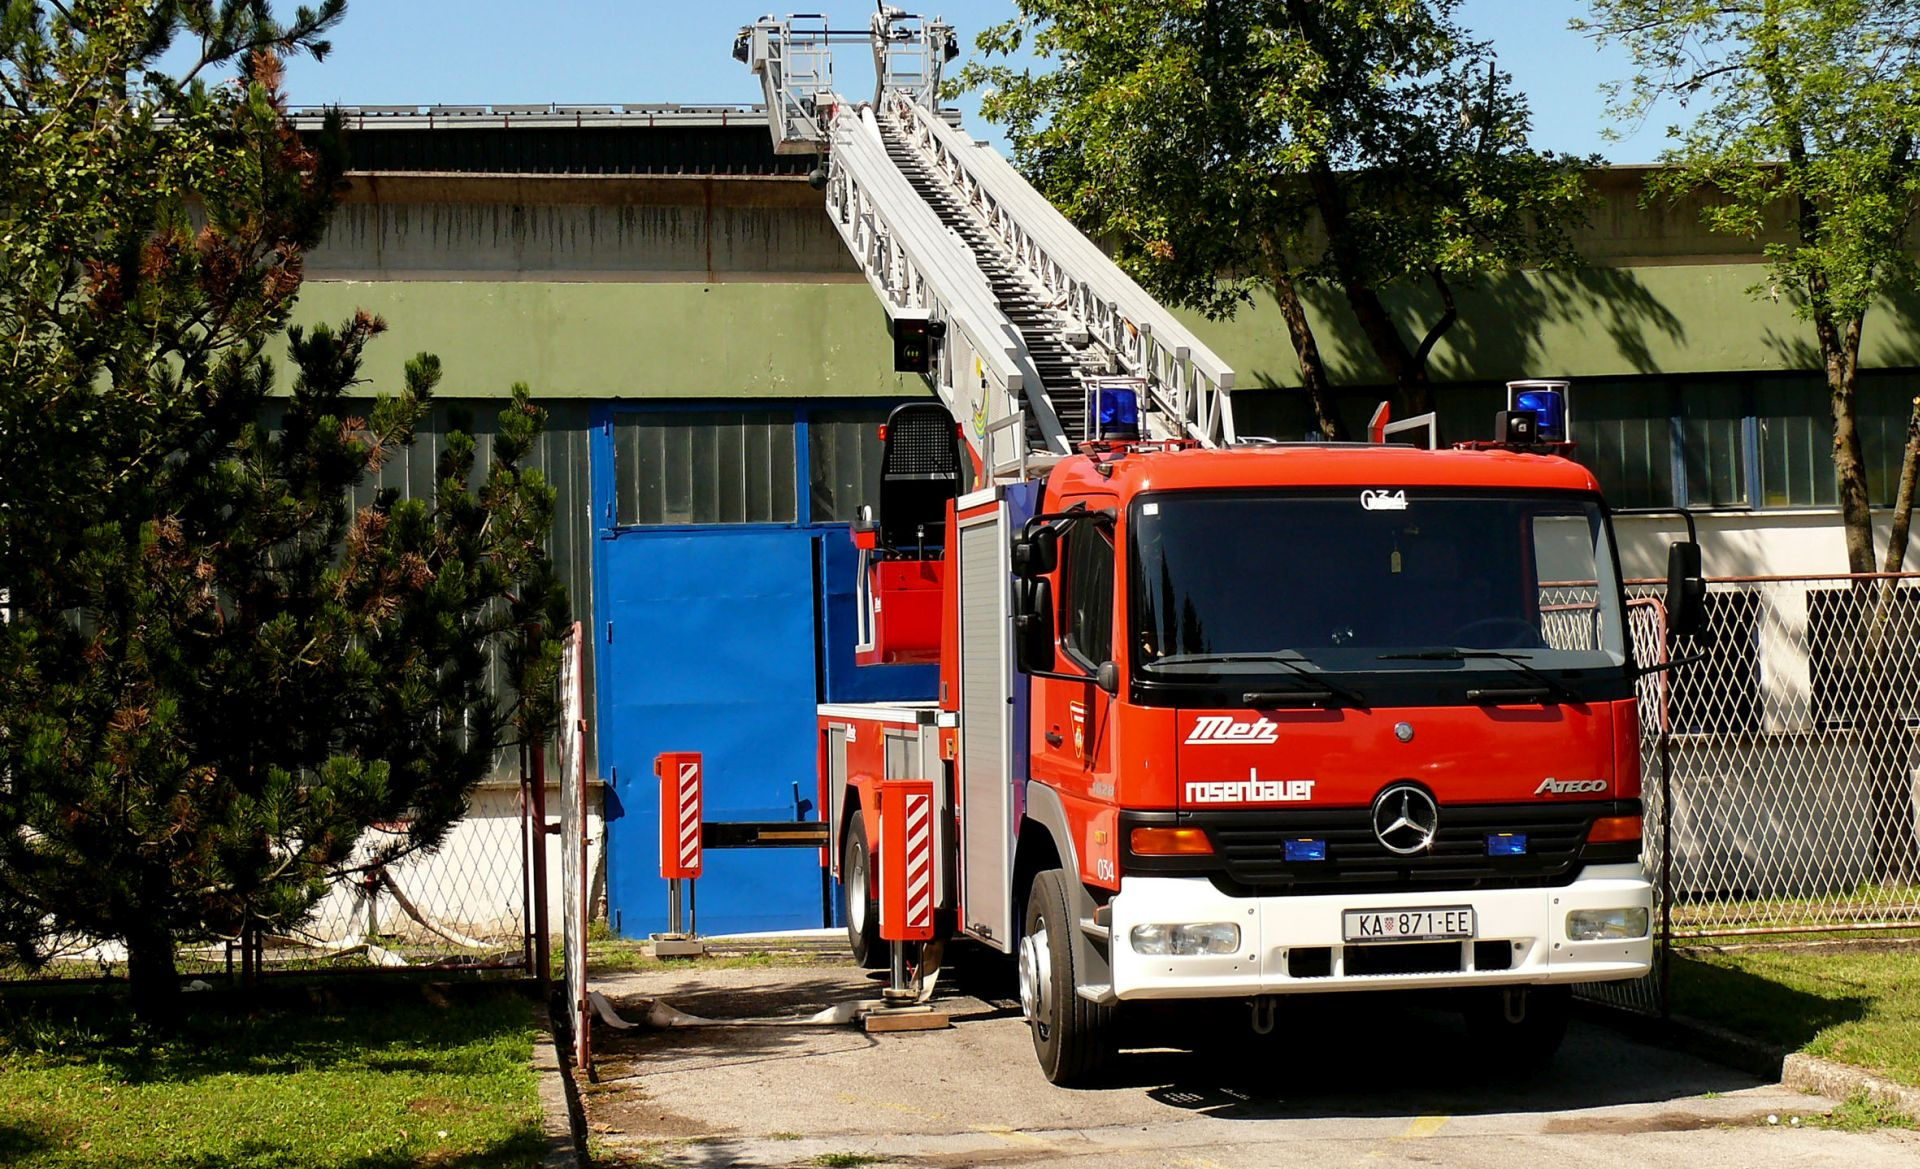 Lokaliziran požar u tvornici Pan u Zagrebu